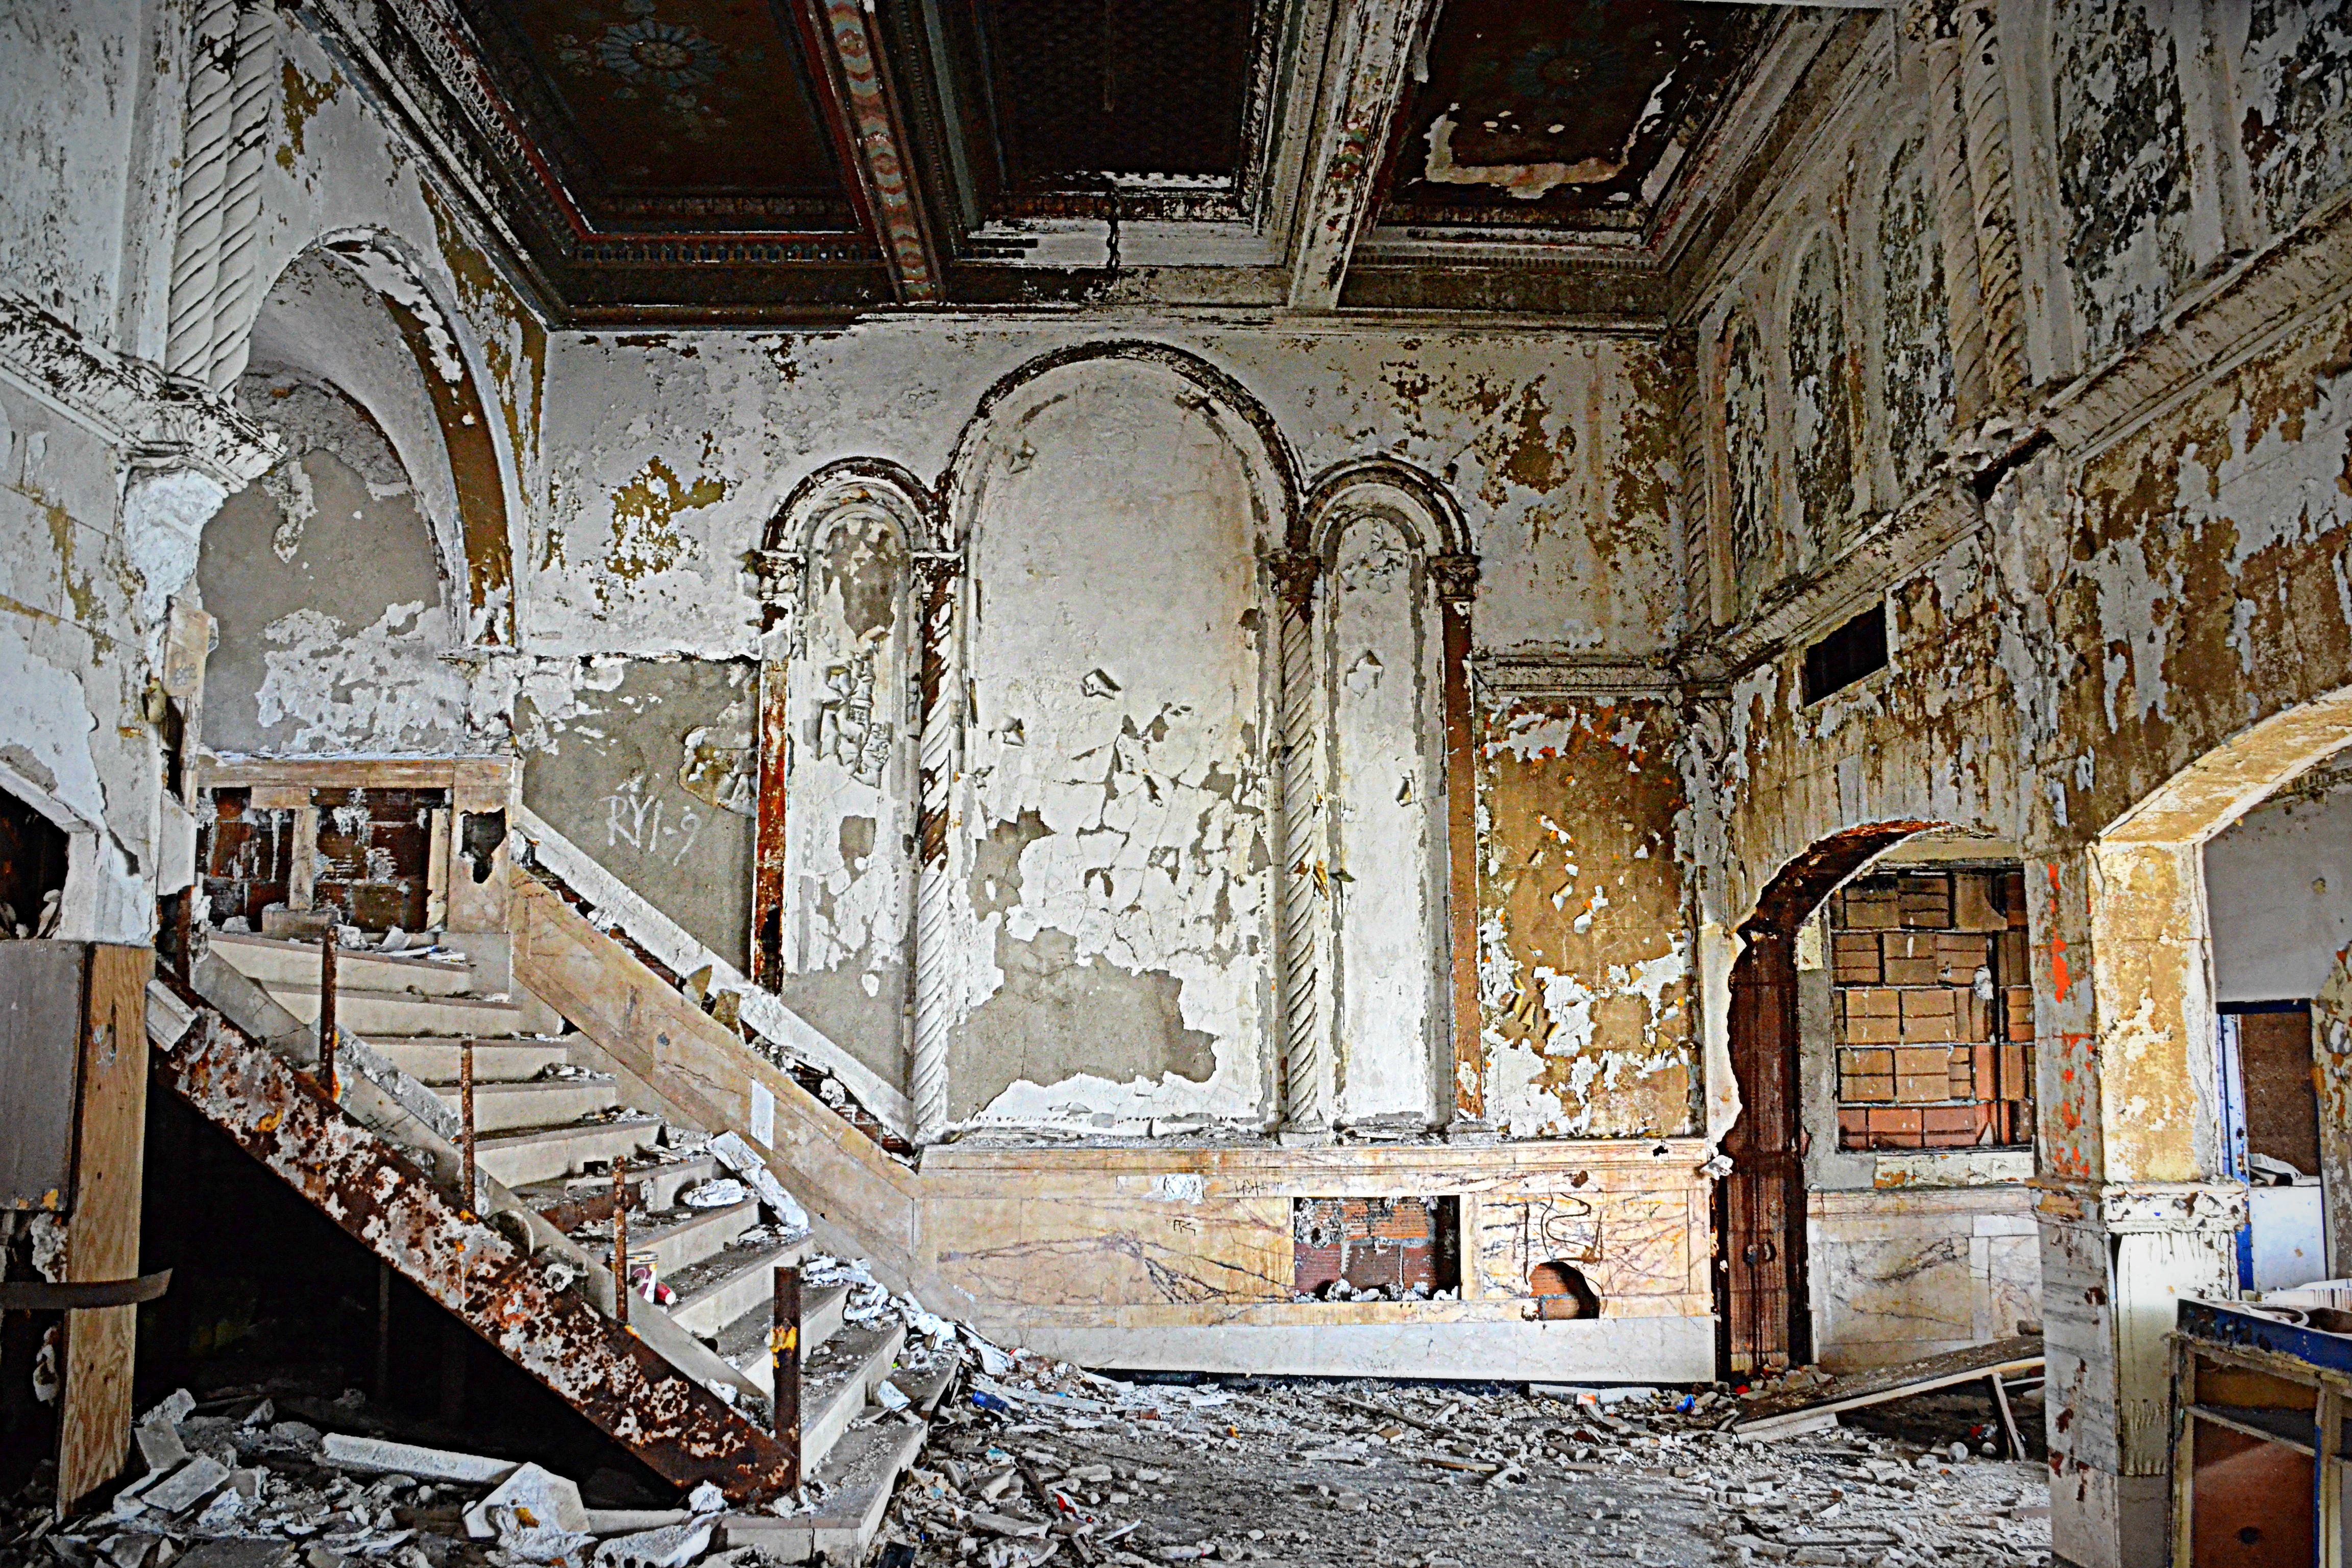 detroit decline – an architectural photo tour | where the robert